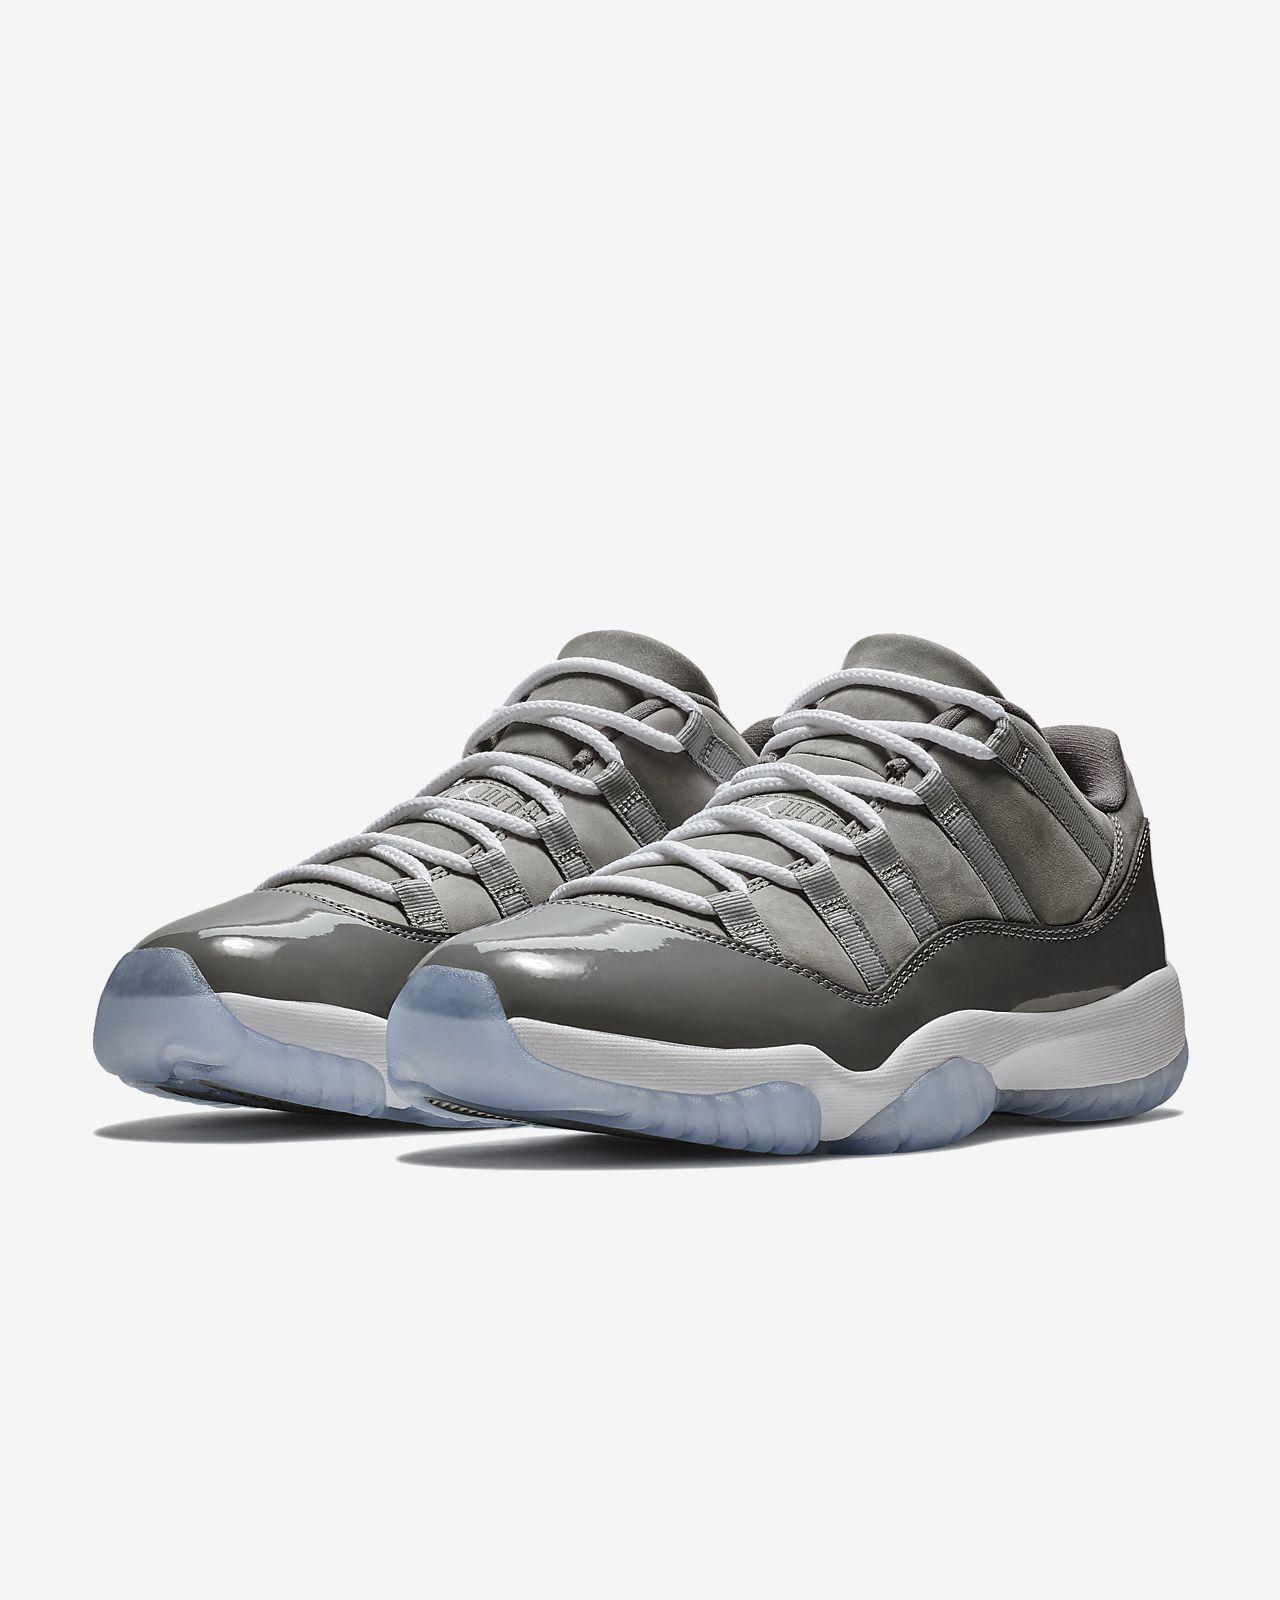 67194a3ef5b3 Air Jordan 11 Retro Low Men s Shoe. Nike.com ID